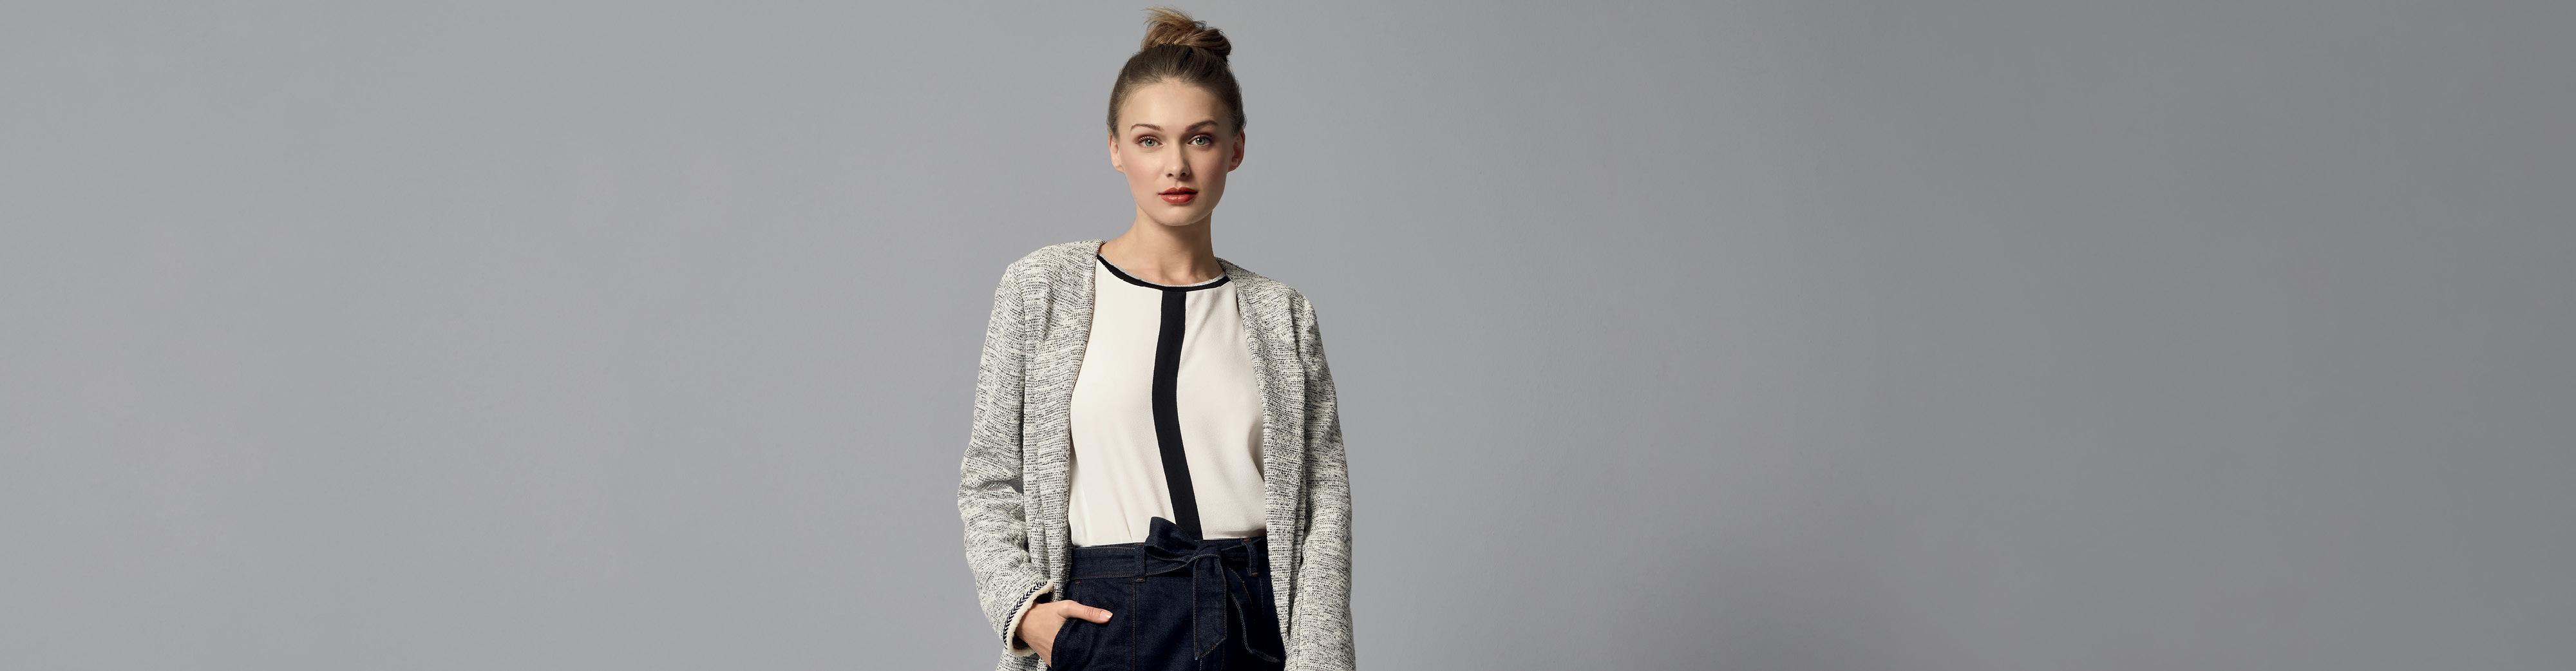 C&A moda žene djeca Zagreb